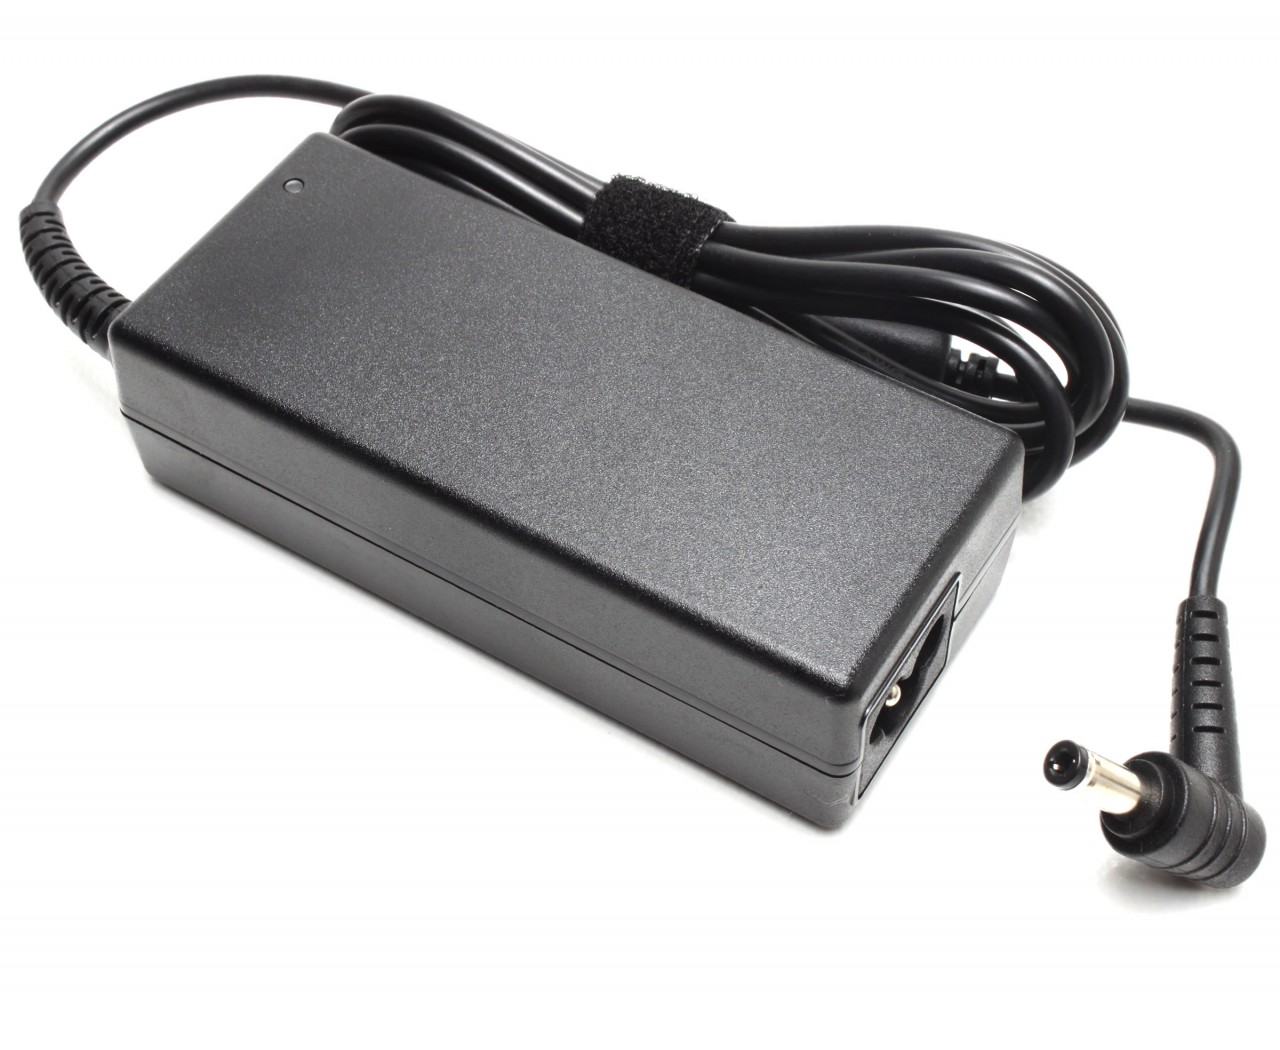 Incarcator Packard Bell EasyNote Packard Bell EasyNote SJ51 imagine powerlaptop.ro 2021